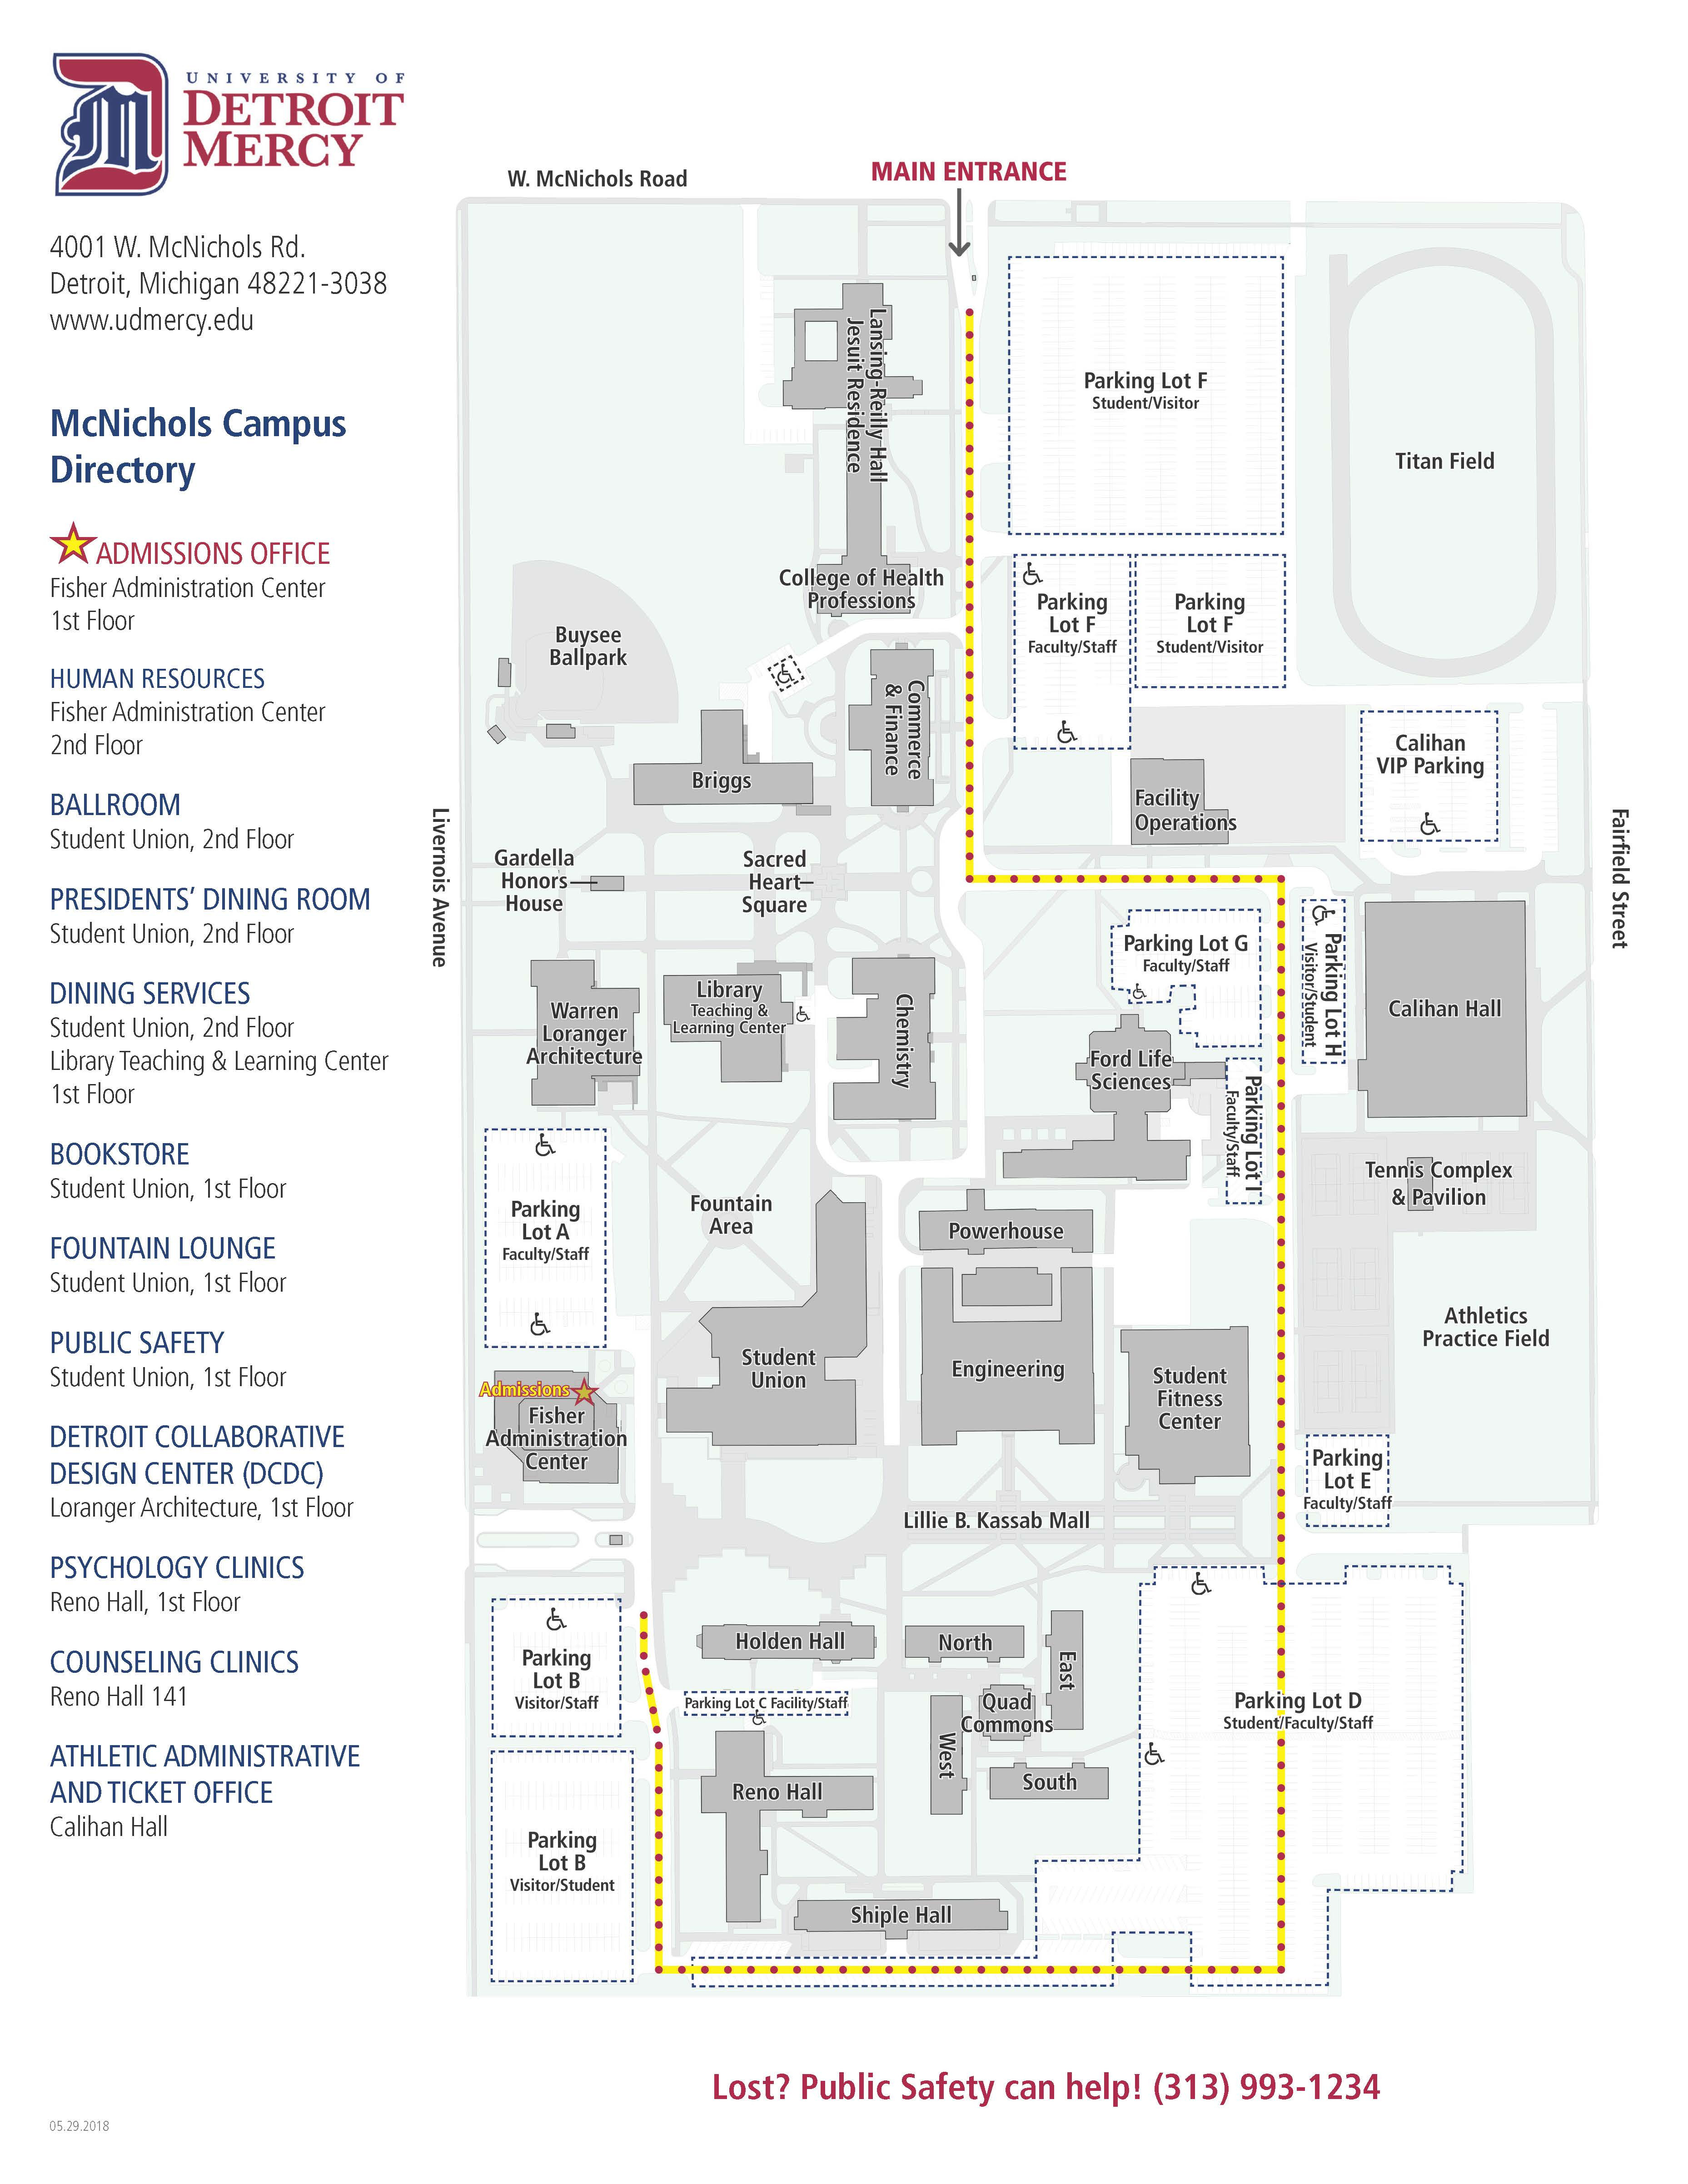 California Science Center Map Best Of Campus Locations - Ettcarworld - California Science Center Map